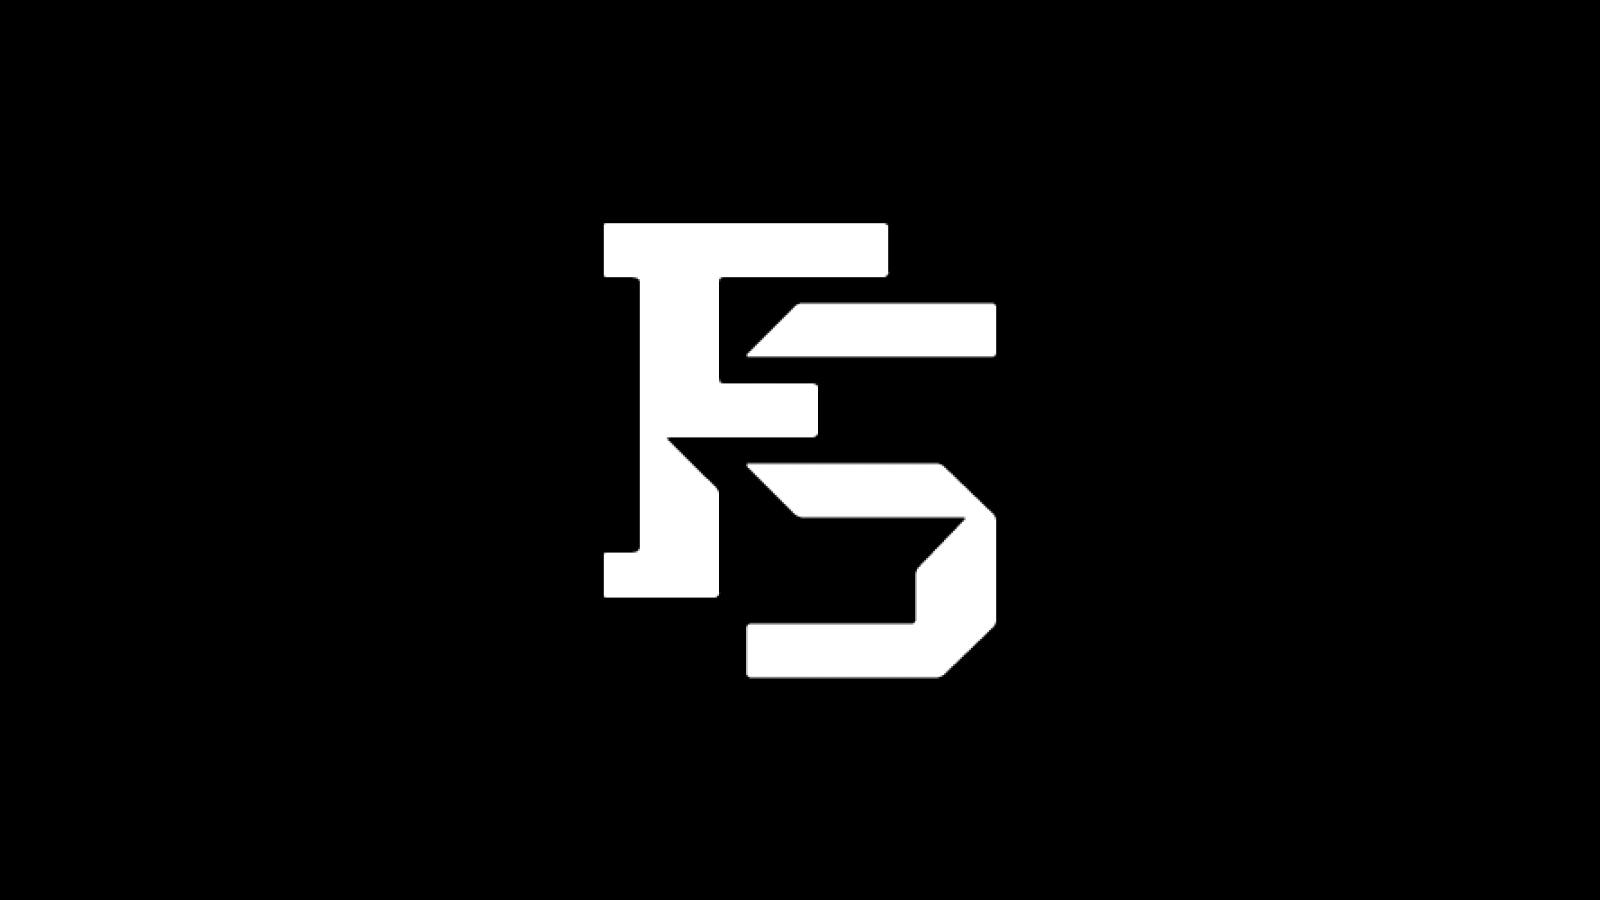 Fatal Strike's logo